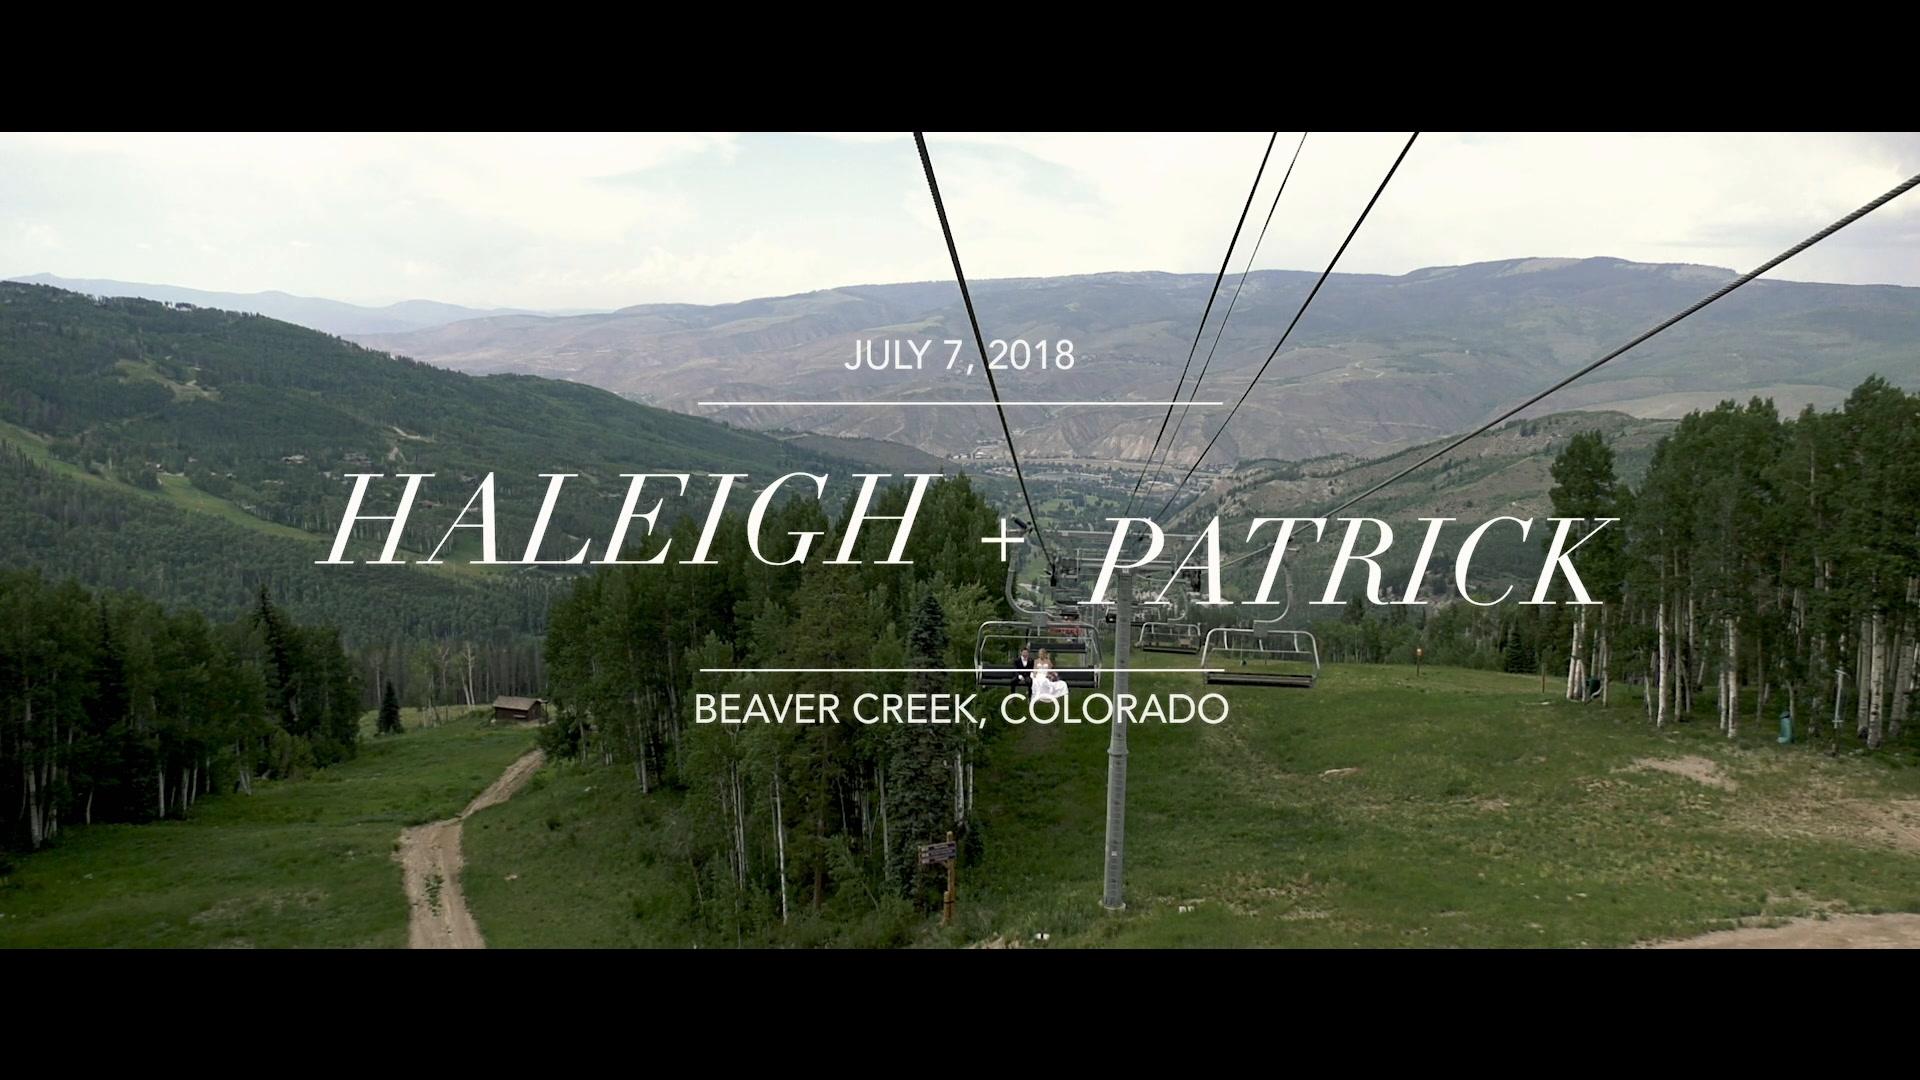 Haleigh + Patrick | Beaver Creek, Colorado | Spruce Saddle Lodge